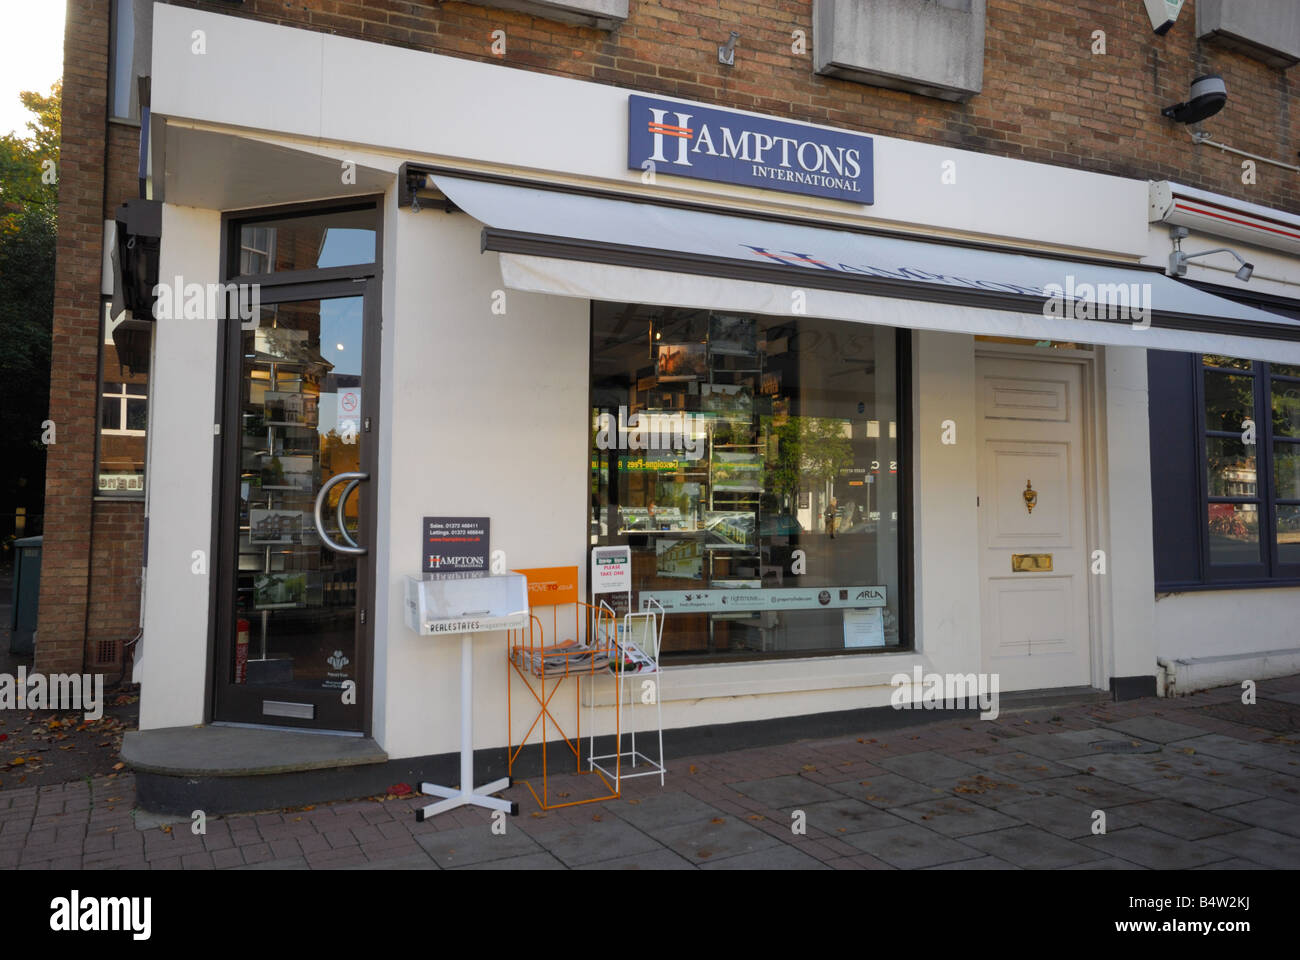 Hamptons Estate Agents - Stock Image